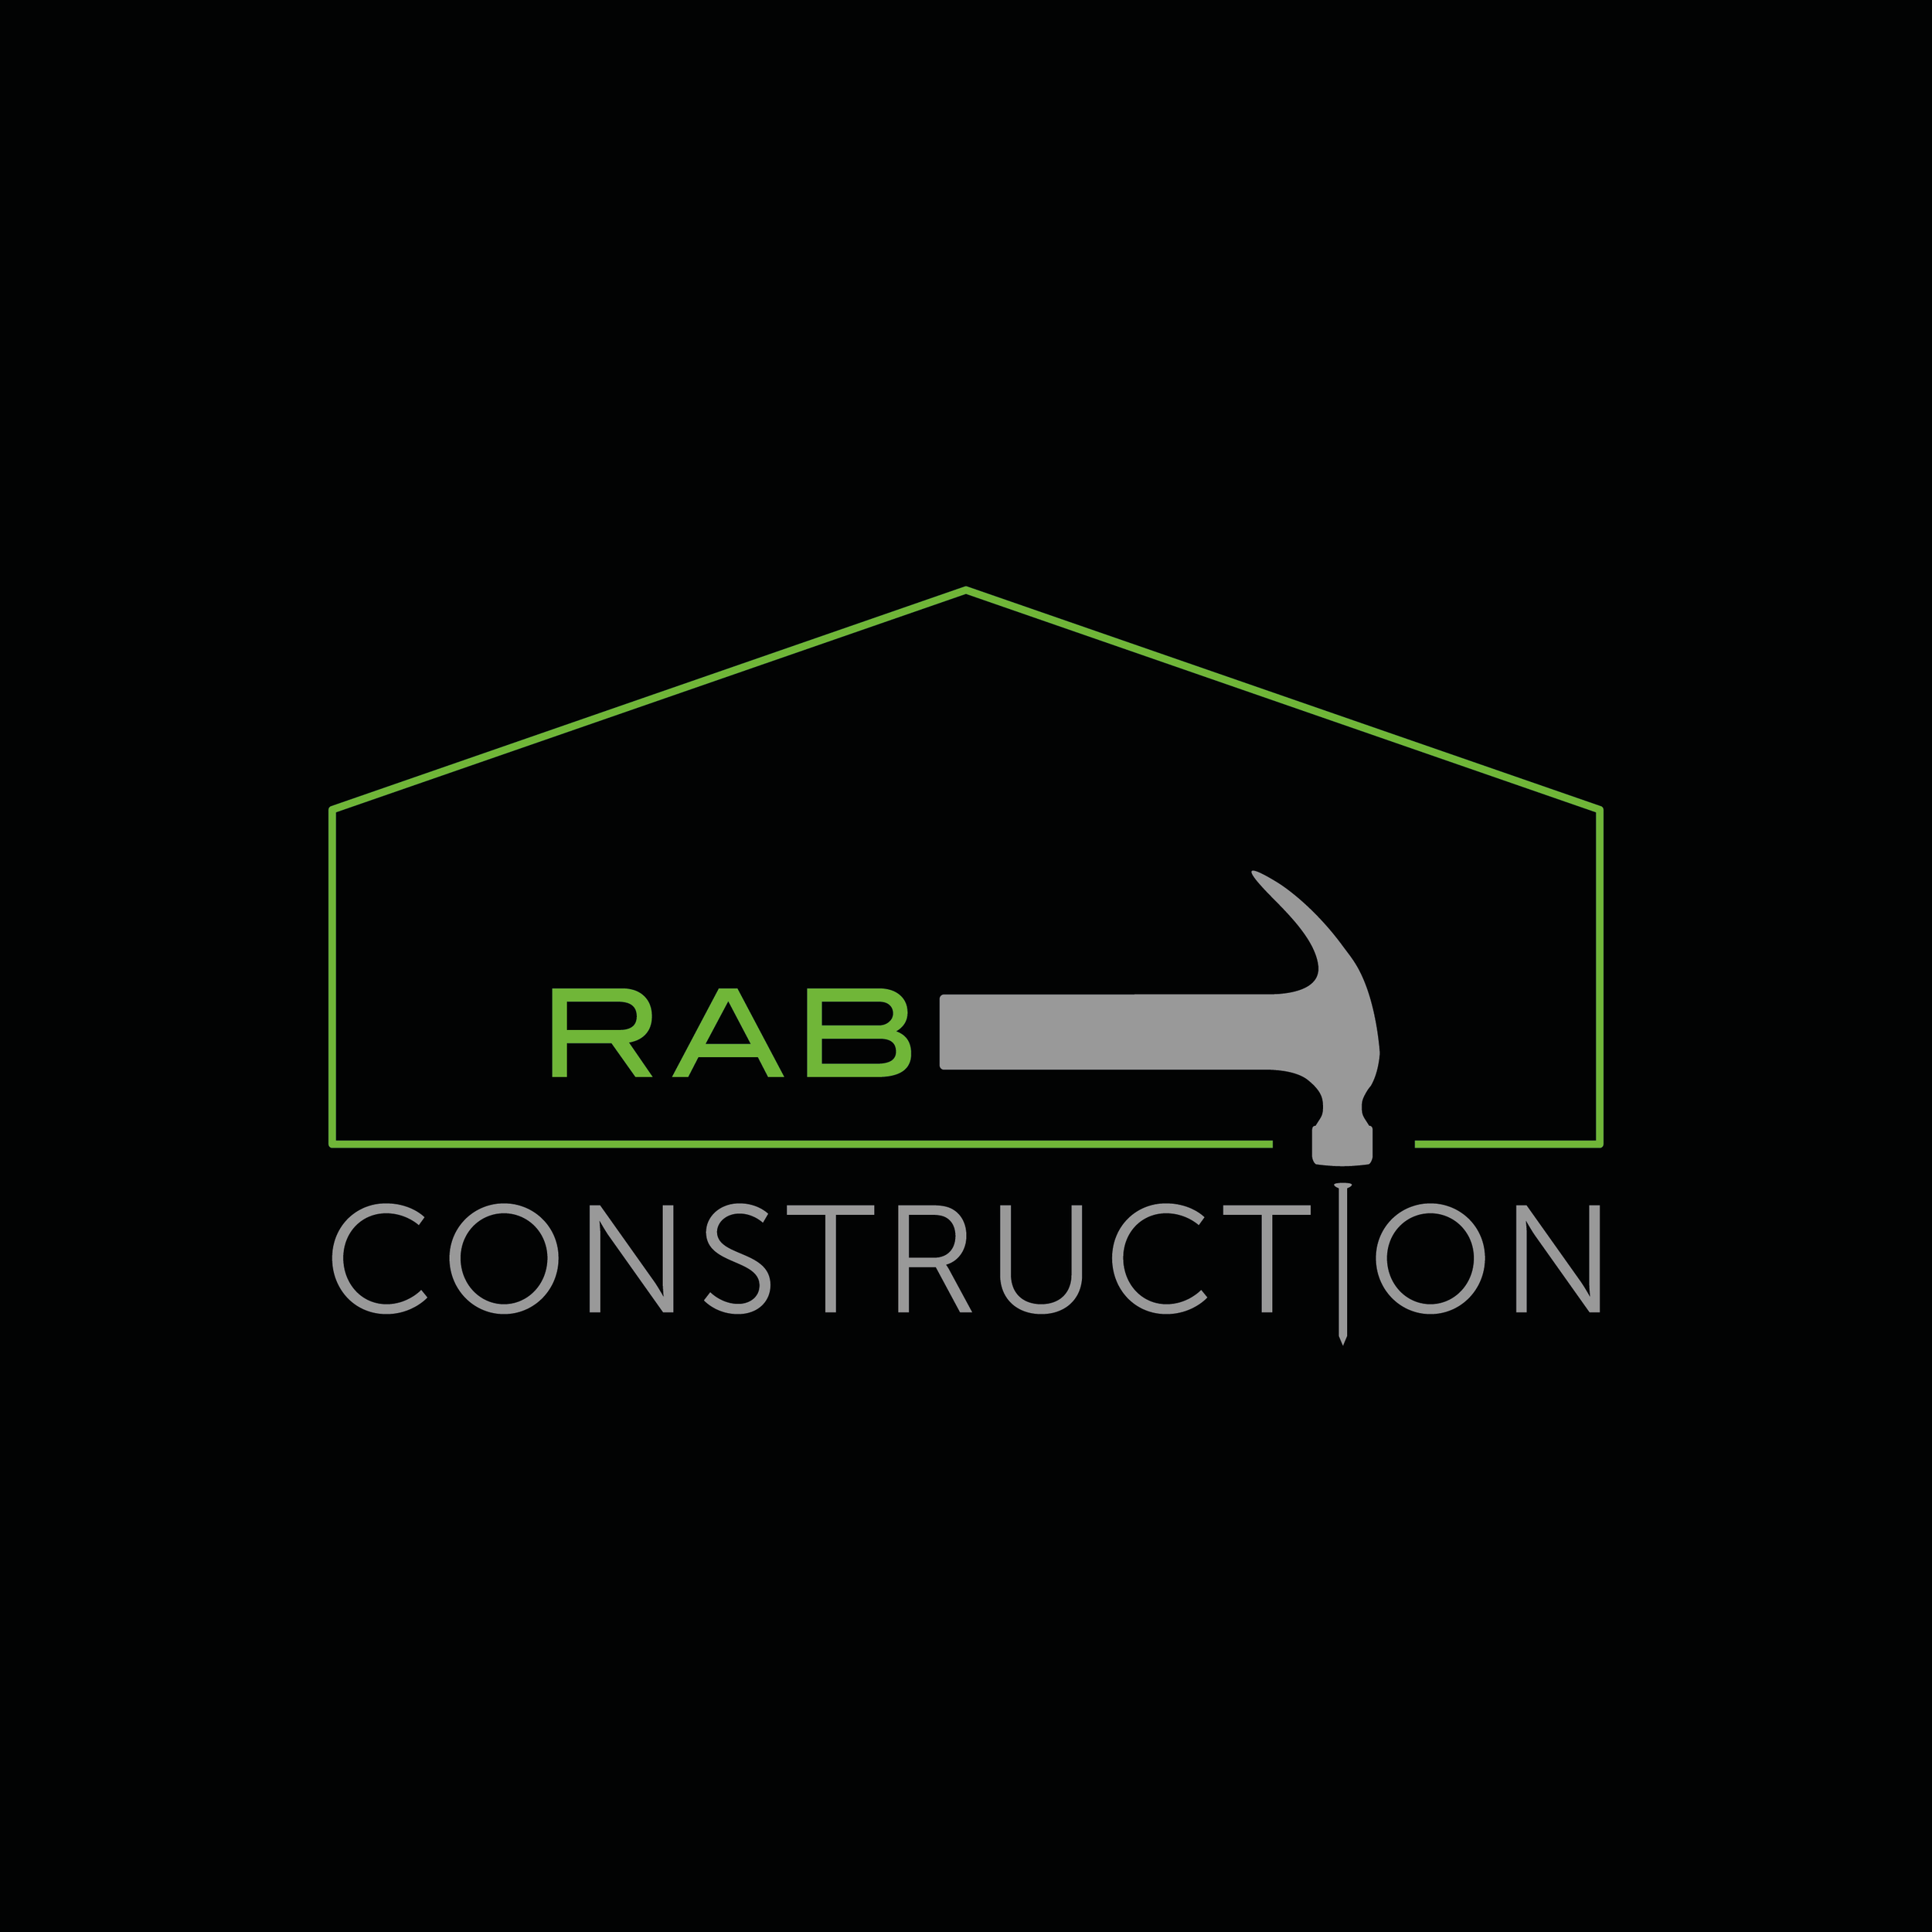 RAB Construction